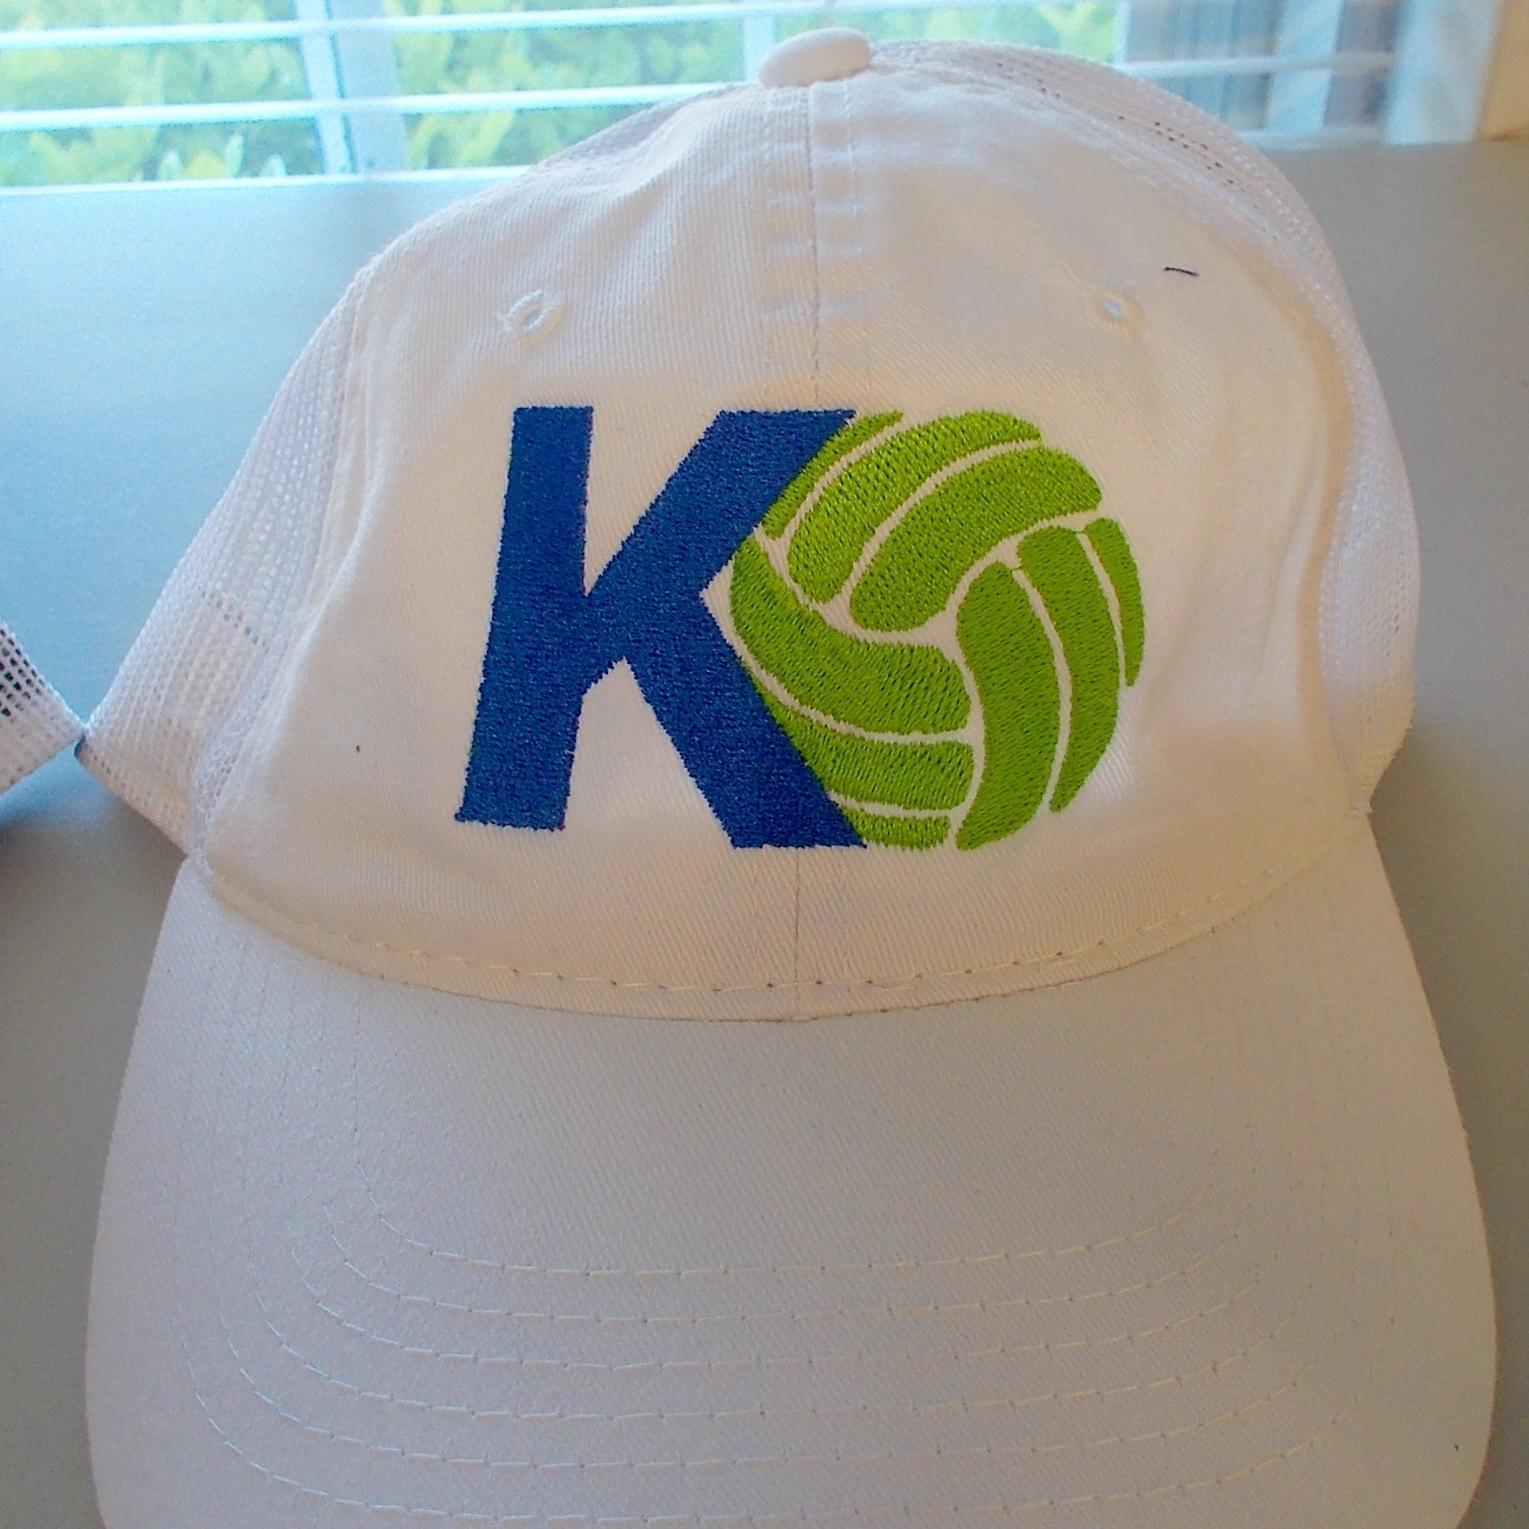 KO Hat - Premium, Low profile mesh back hat.White - $20